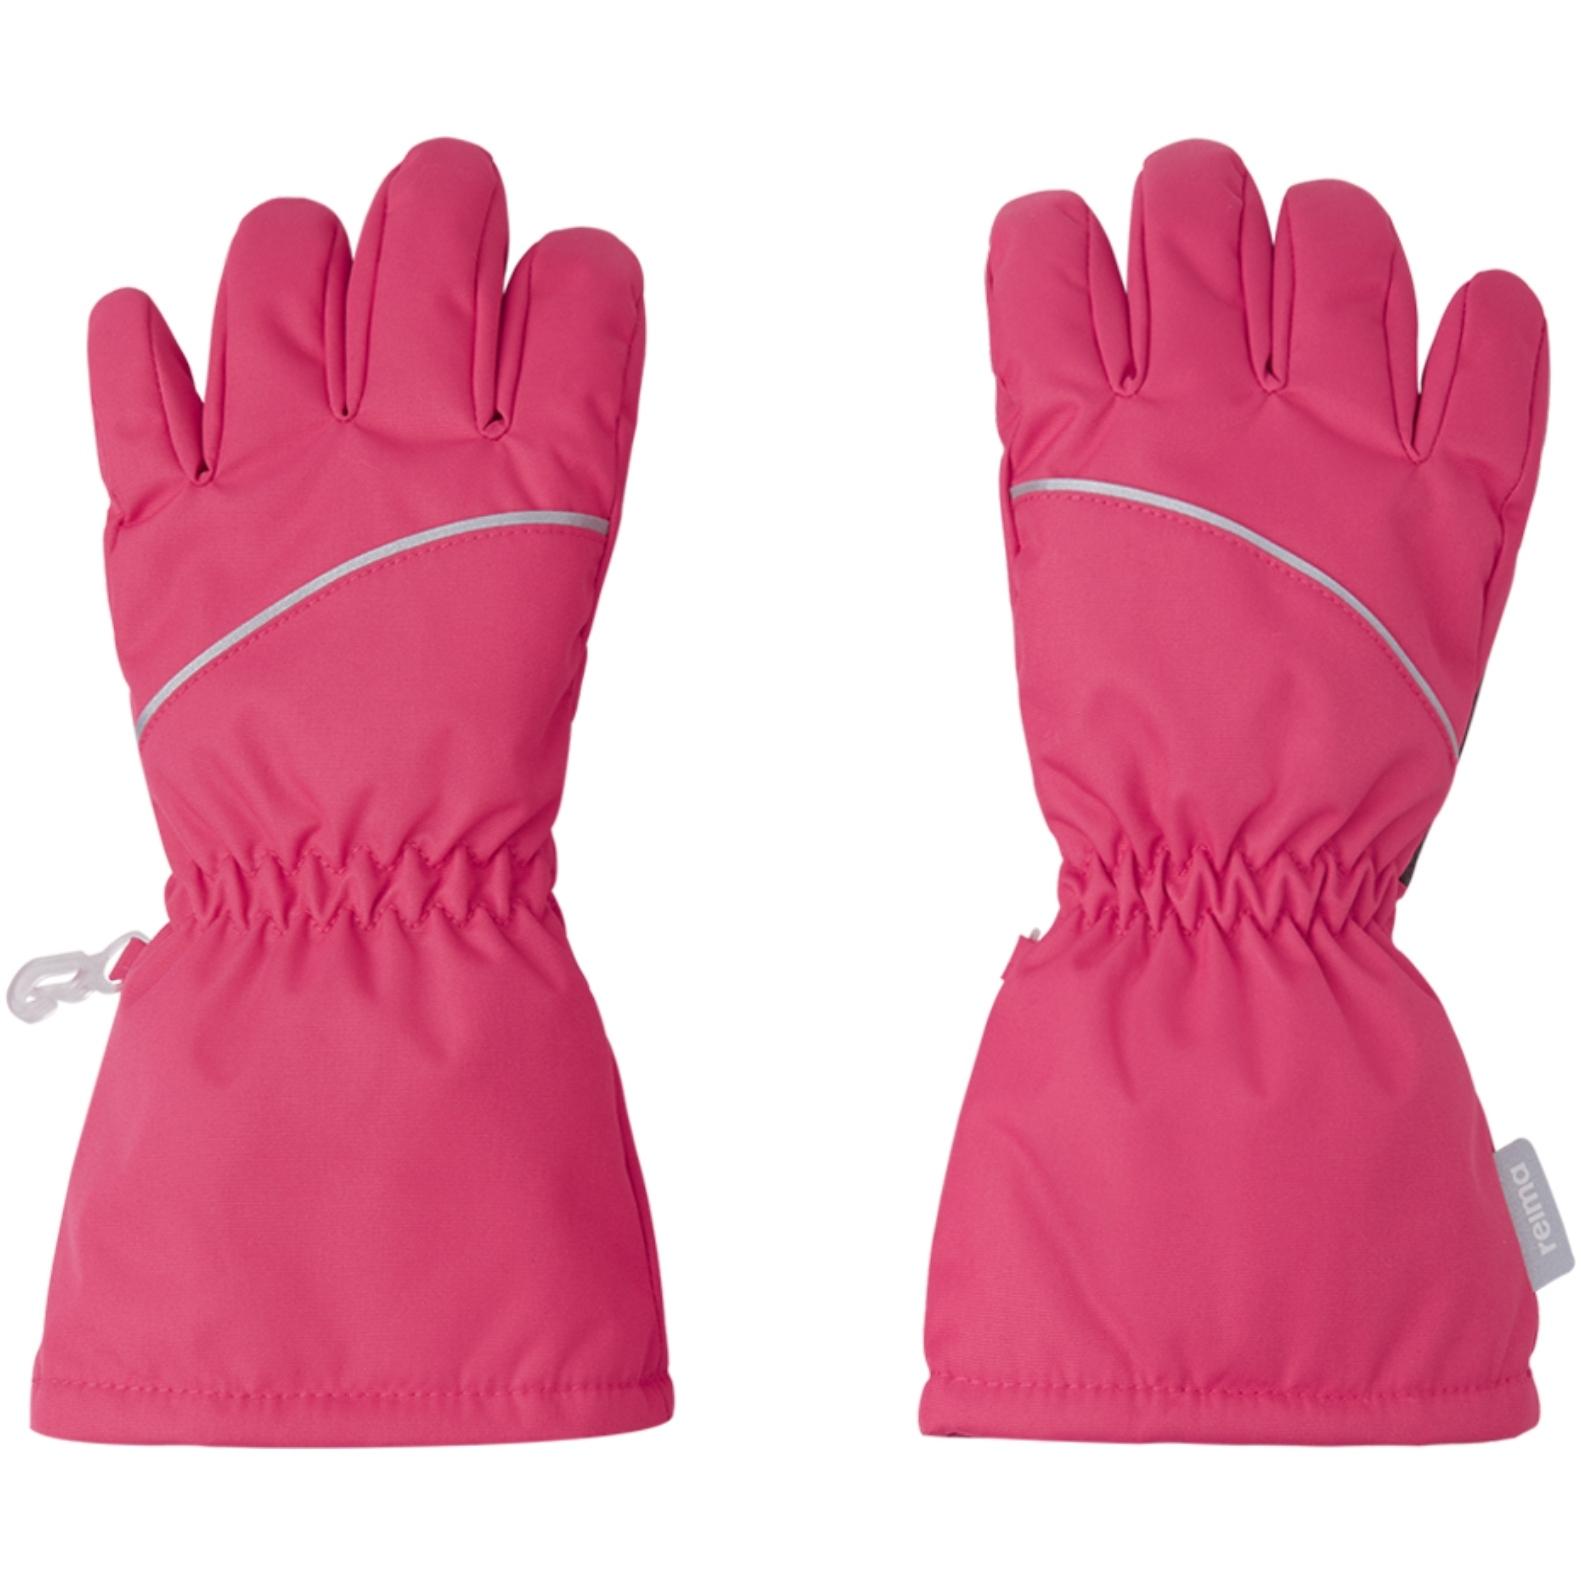 Picture of Reima Kids Gloves (woven) Milne - azalea pink